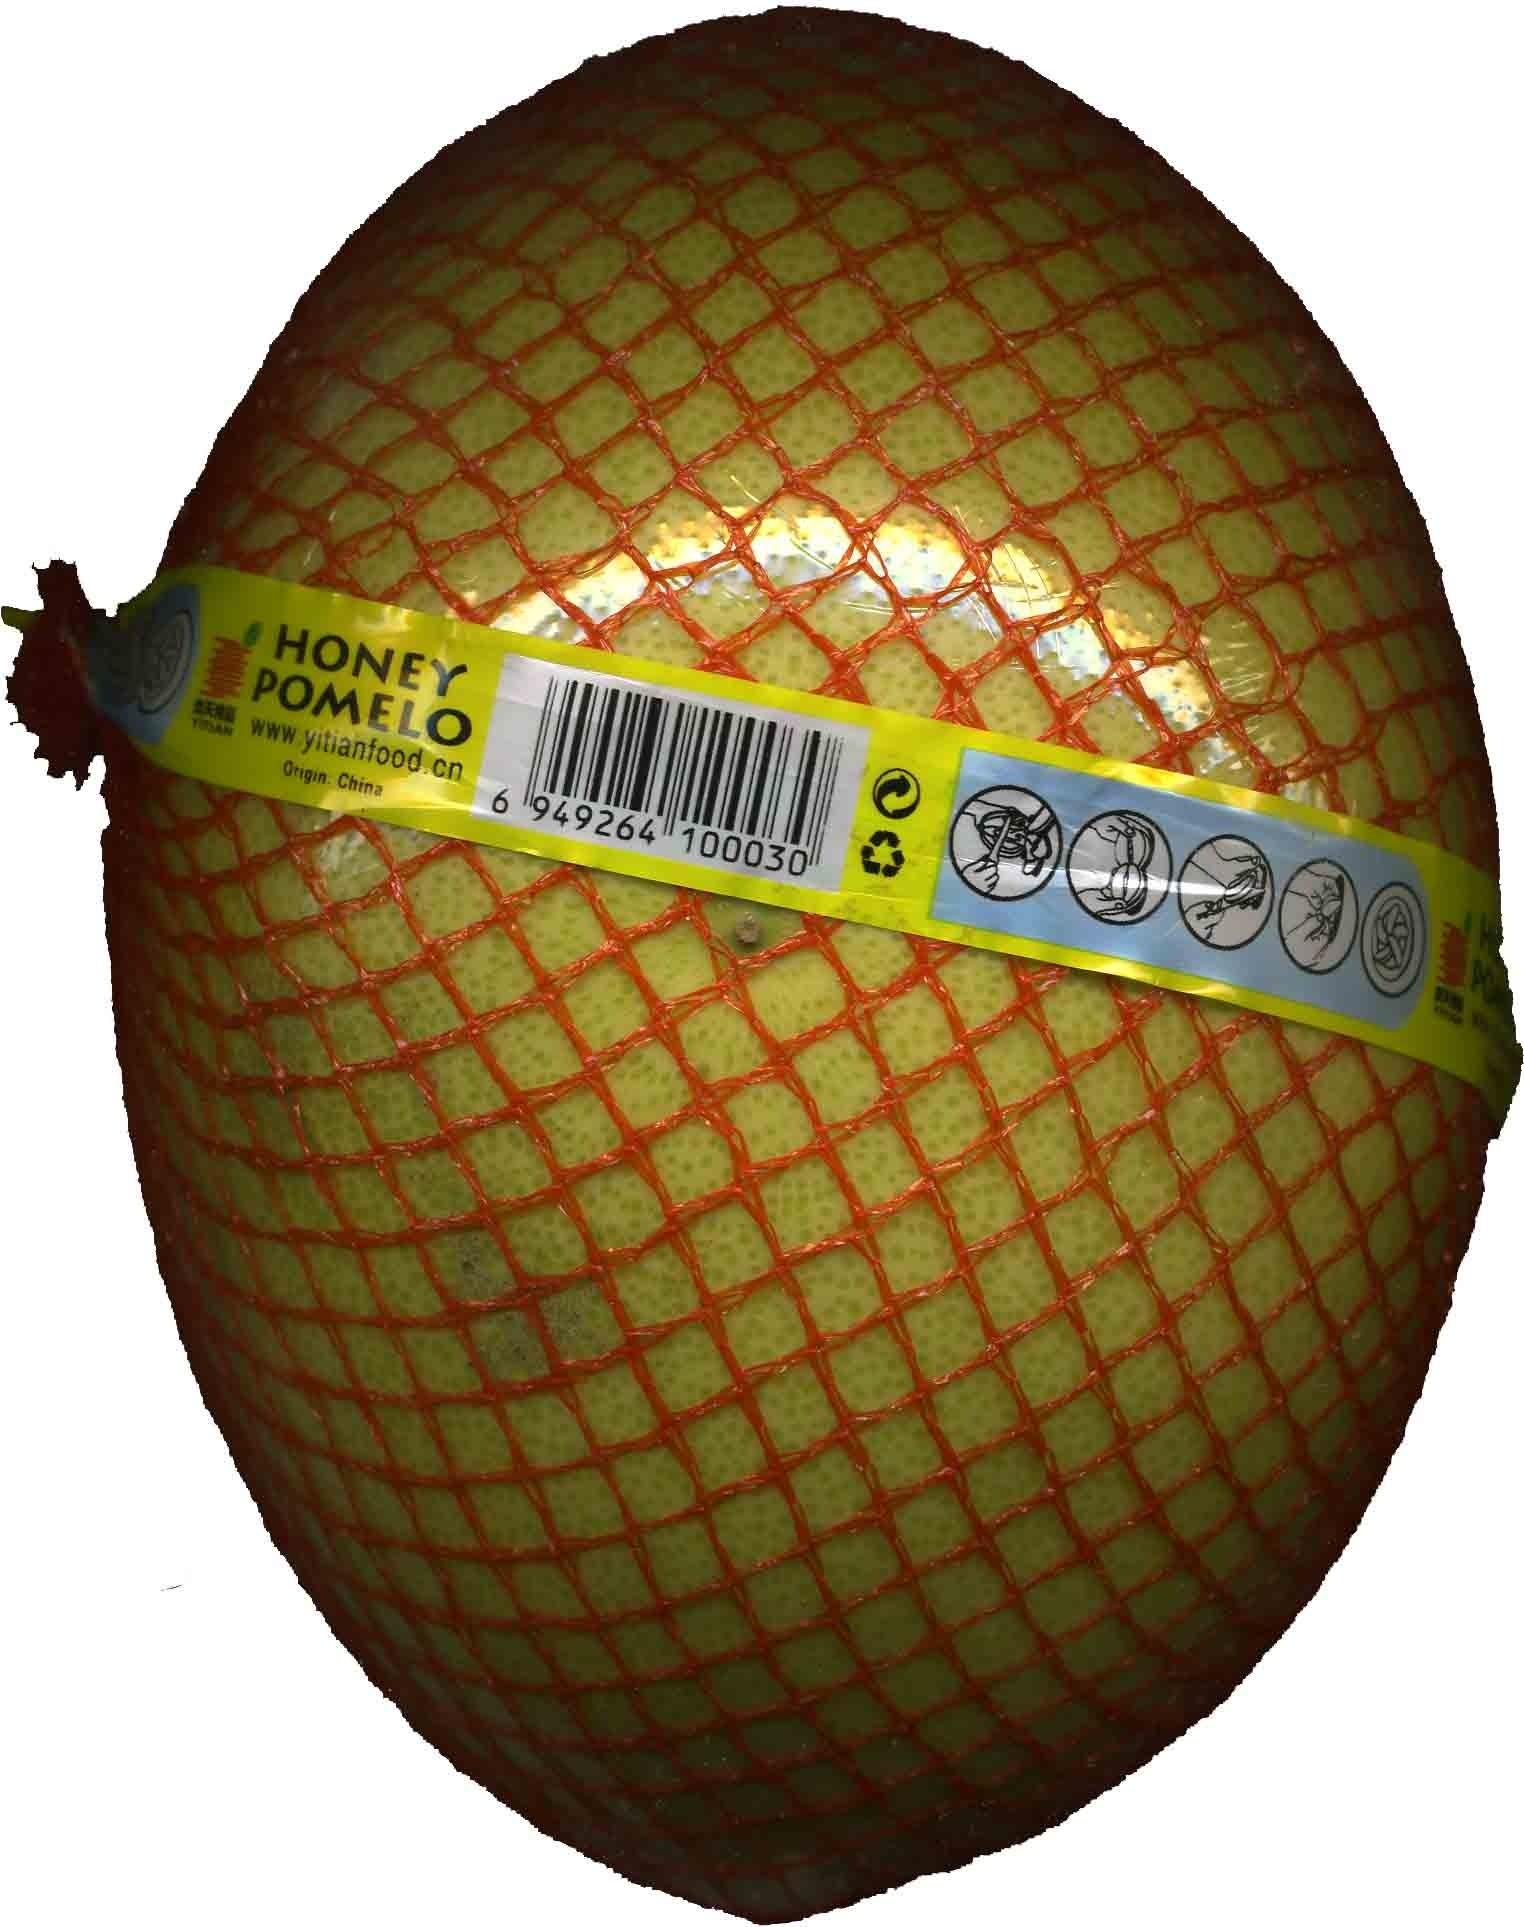 Honey pomelo - Product - es